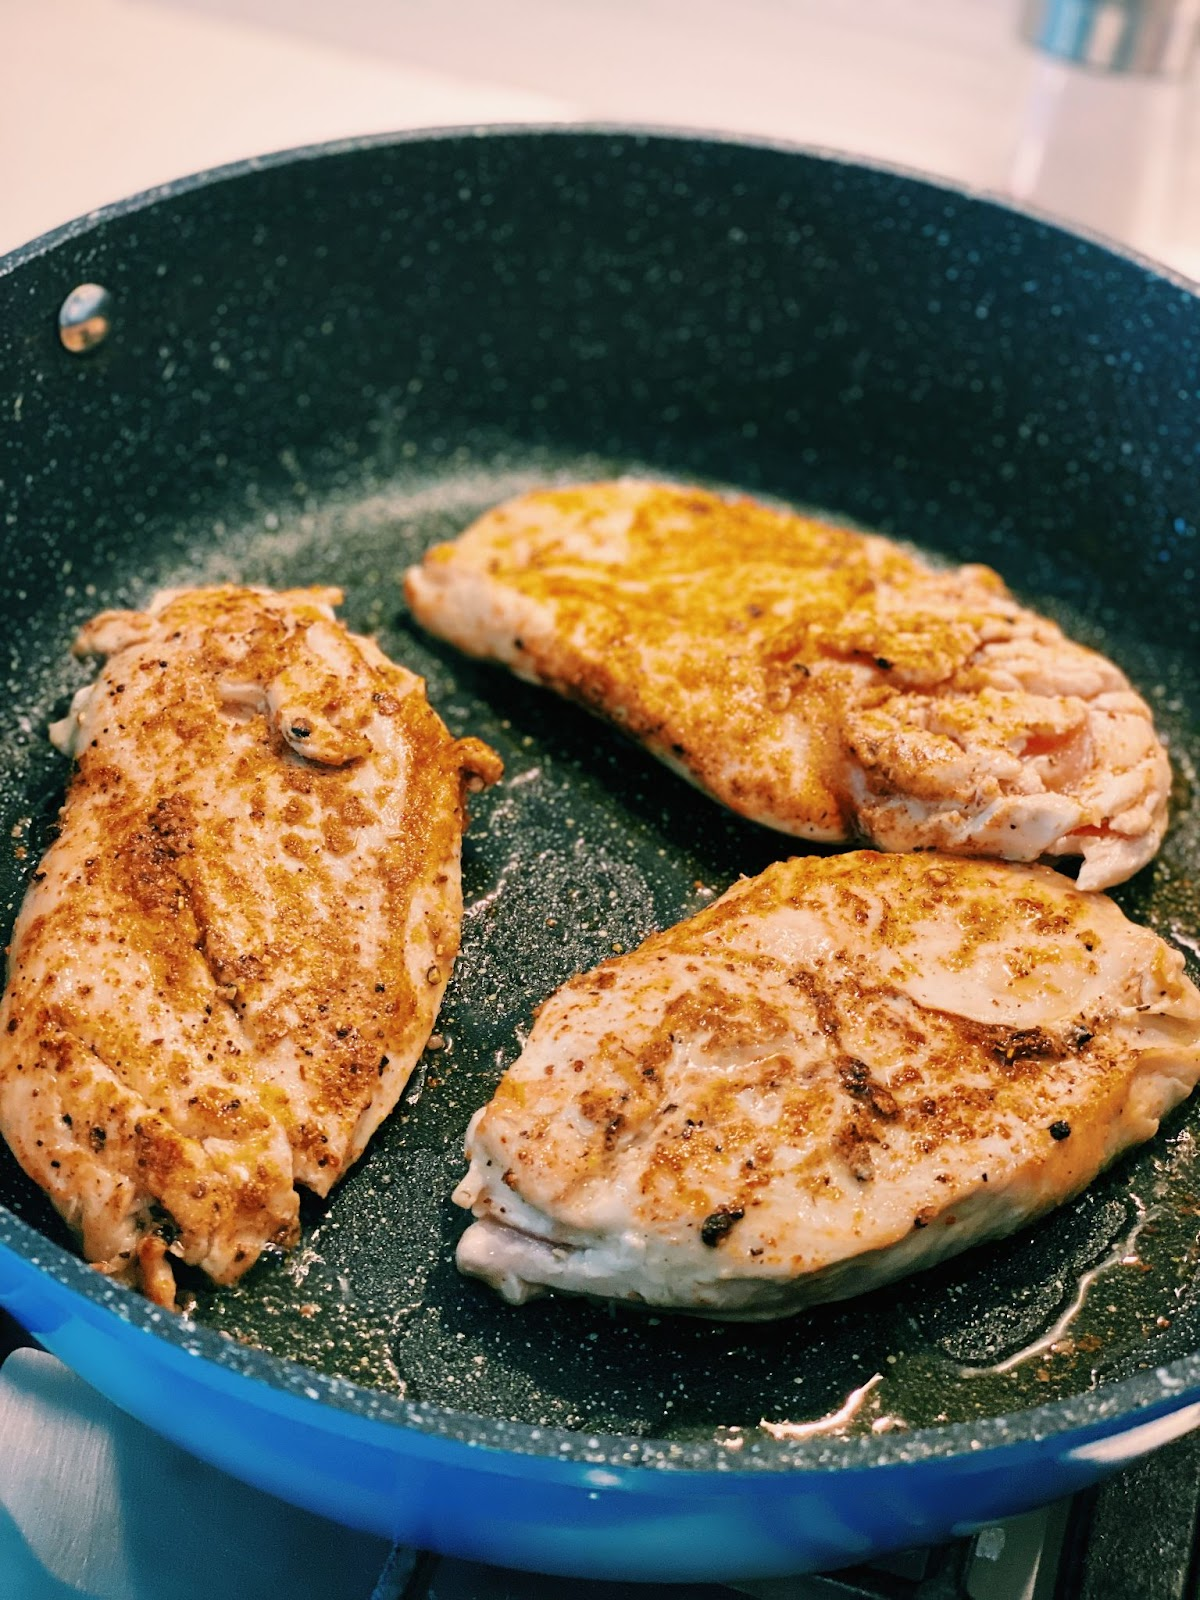 Pan-fry juicy chicken breast